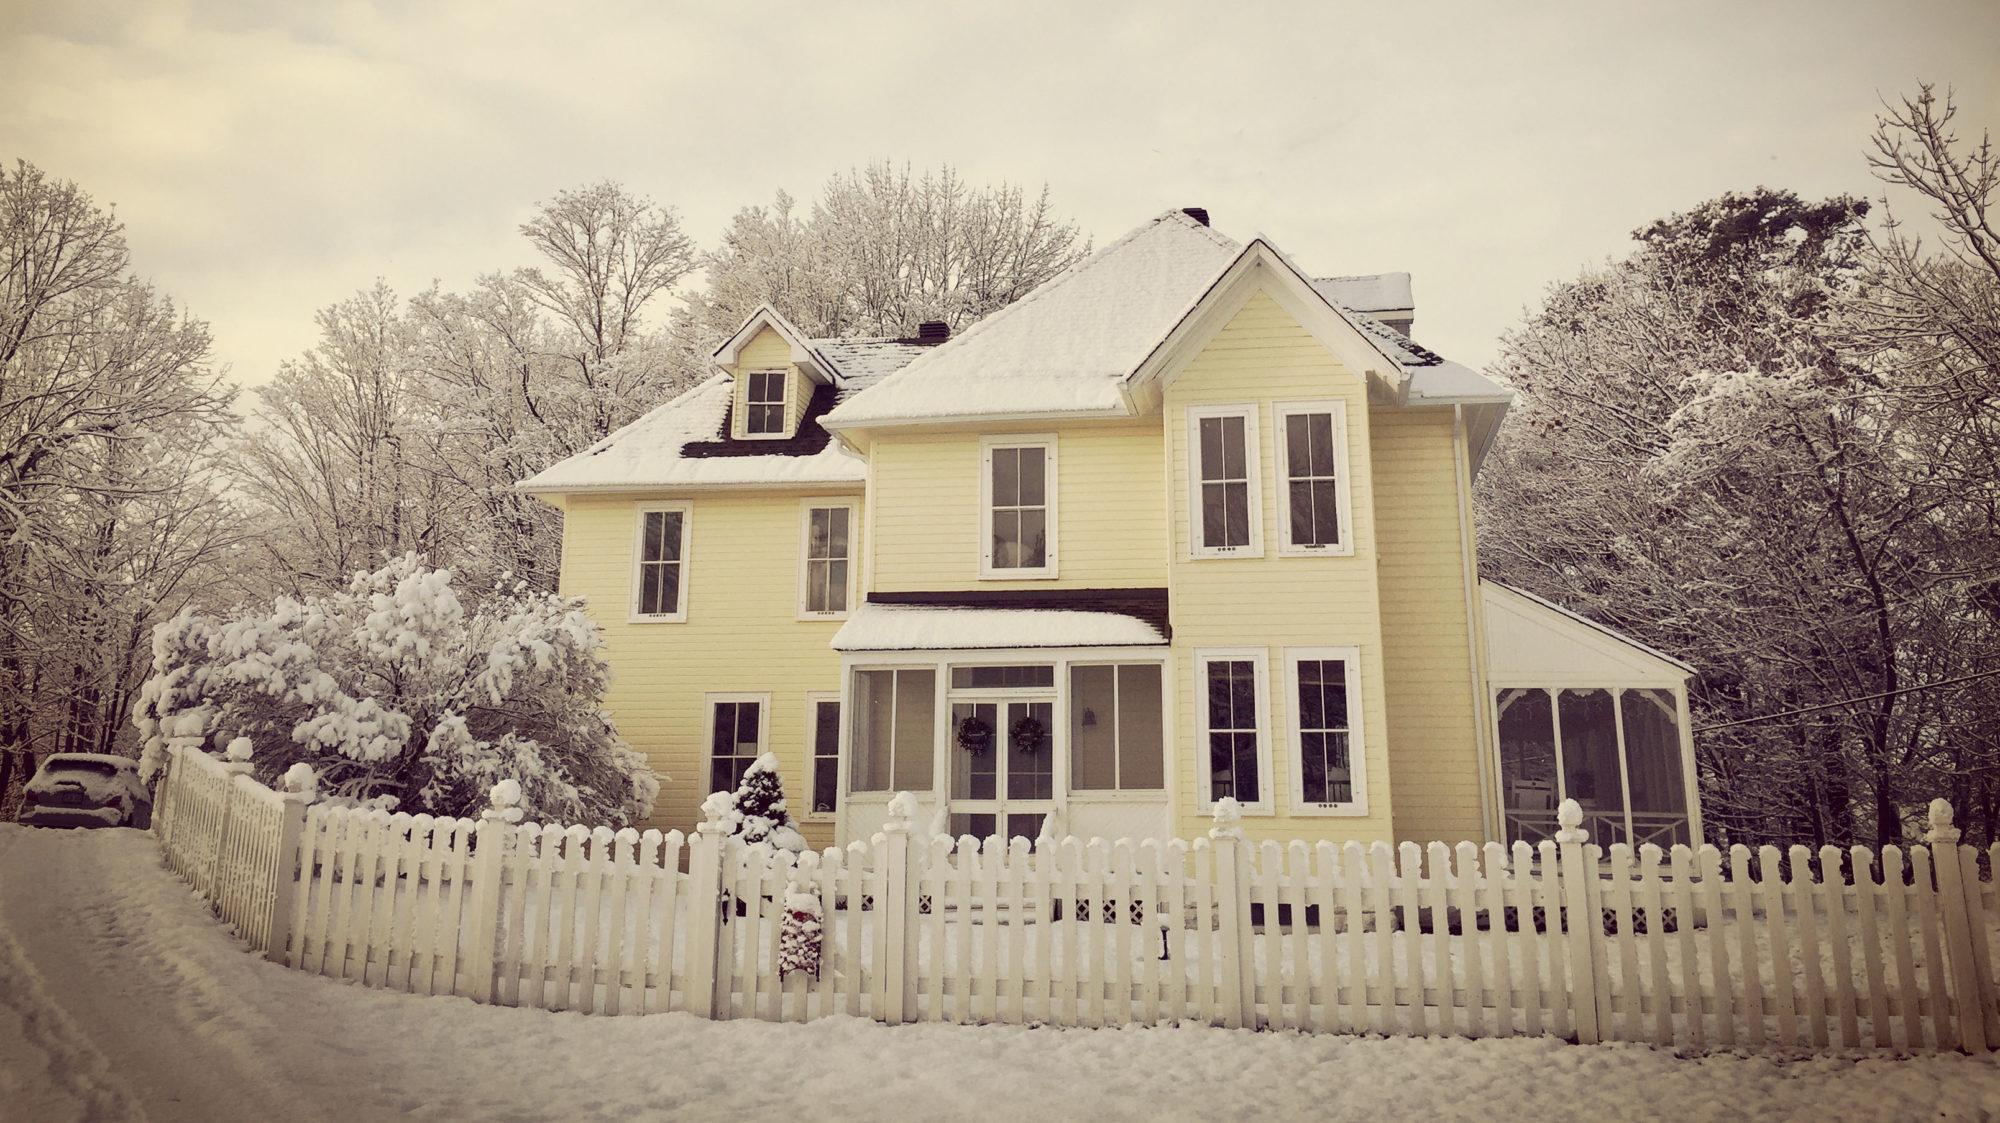 www.tetthouse.com